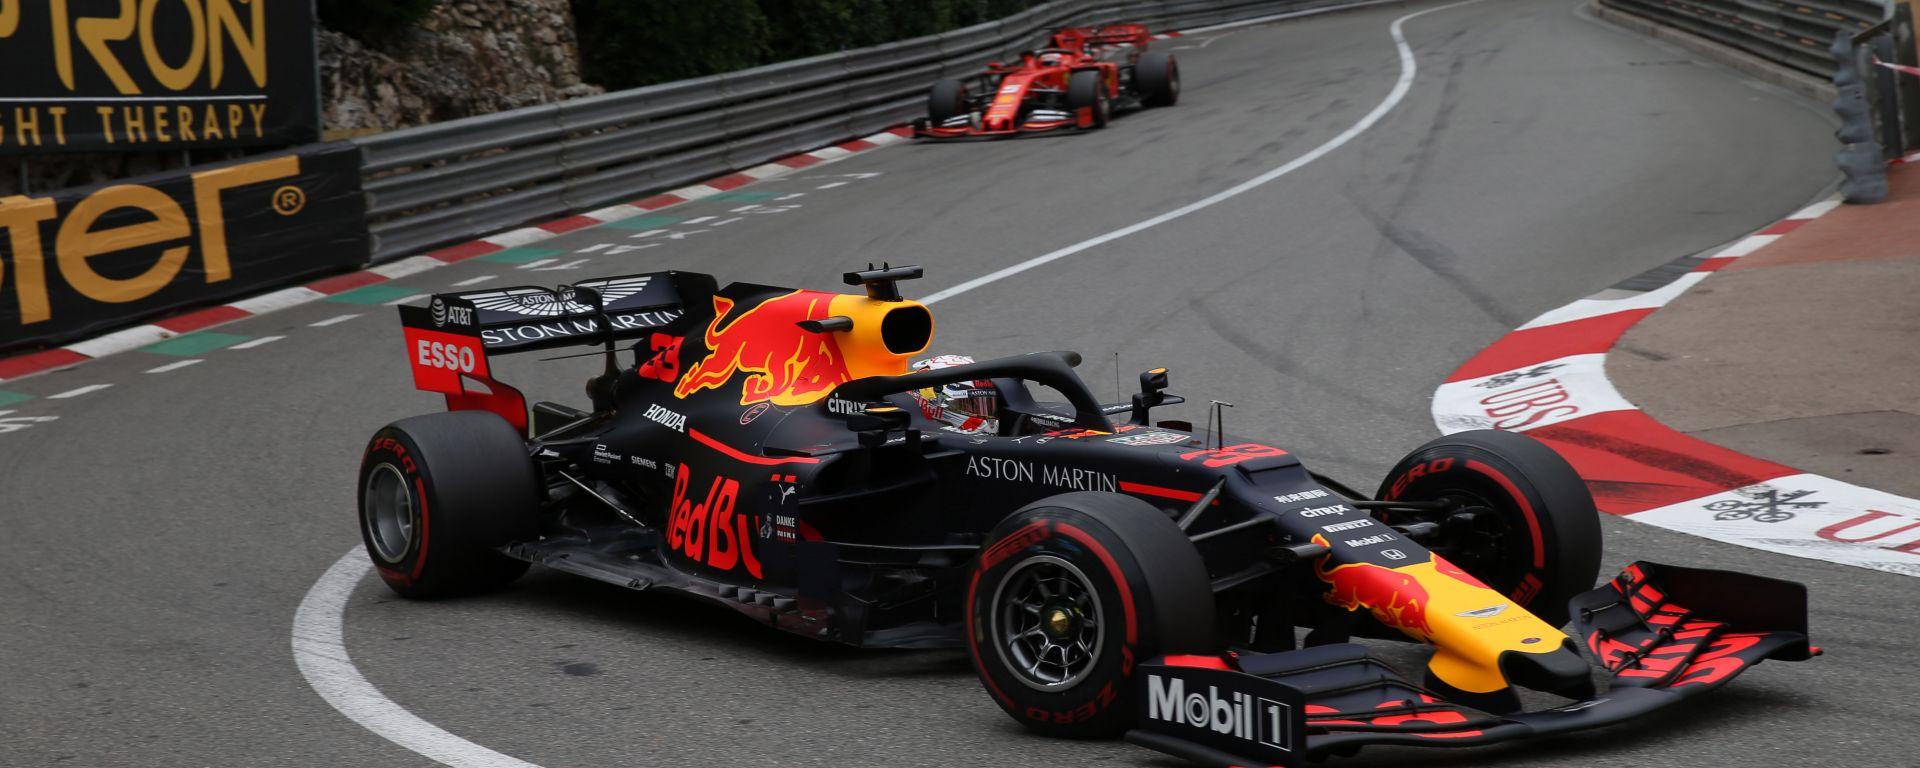 F1, Montreal: Verstappen mette nel mirino la Ferrari